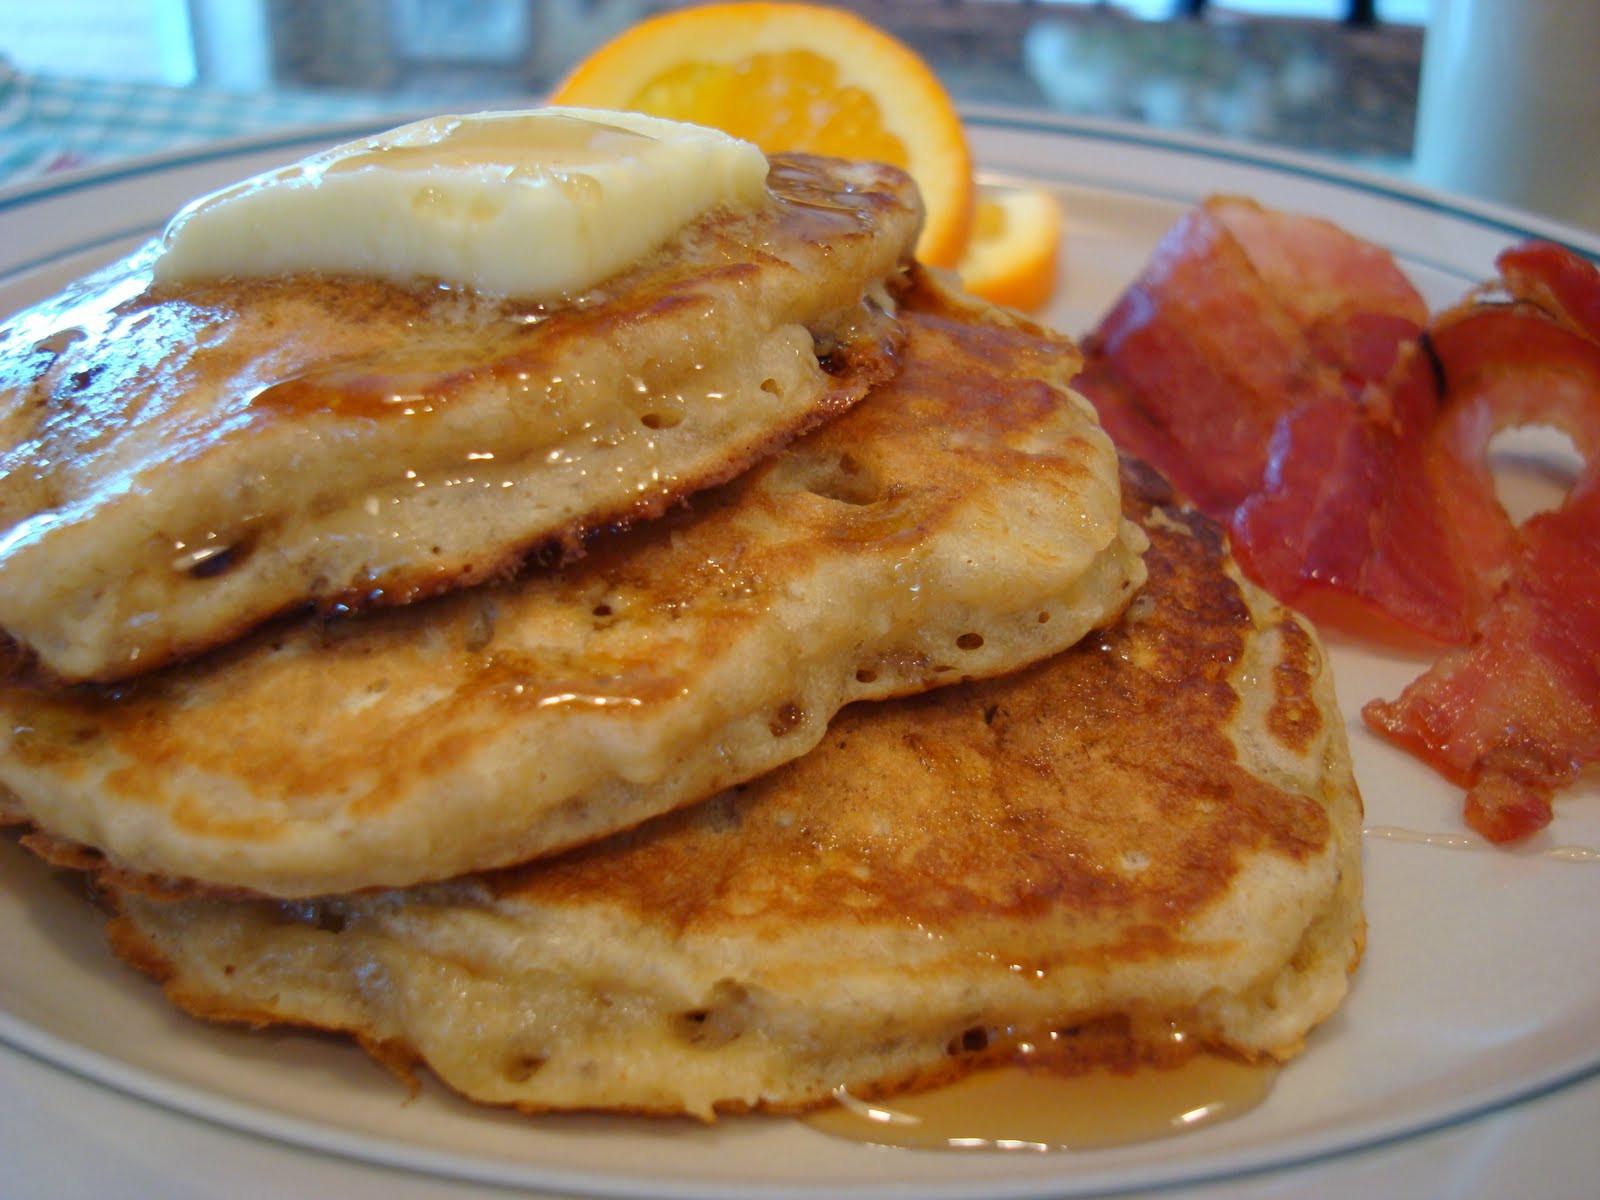 Oatmeal Banana Pancakes  Mennonite Girls Can Cook Banana Oatmeal Pancakes